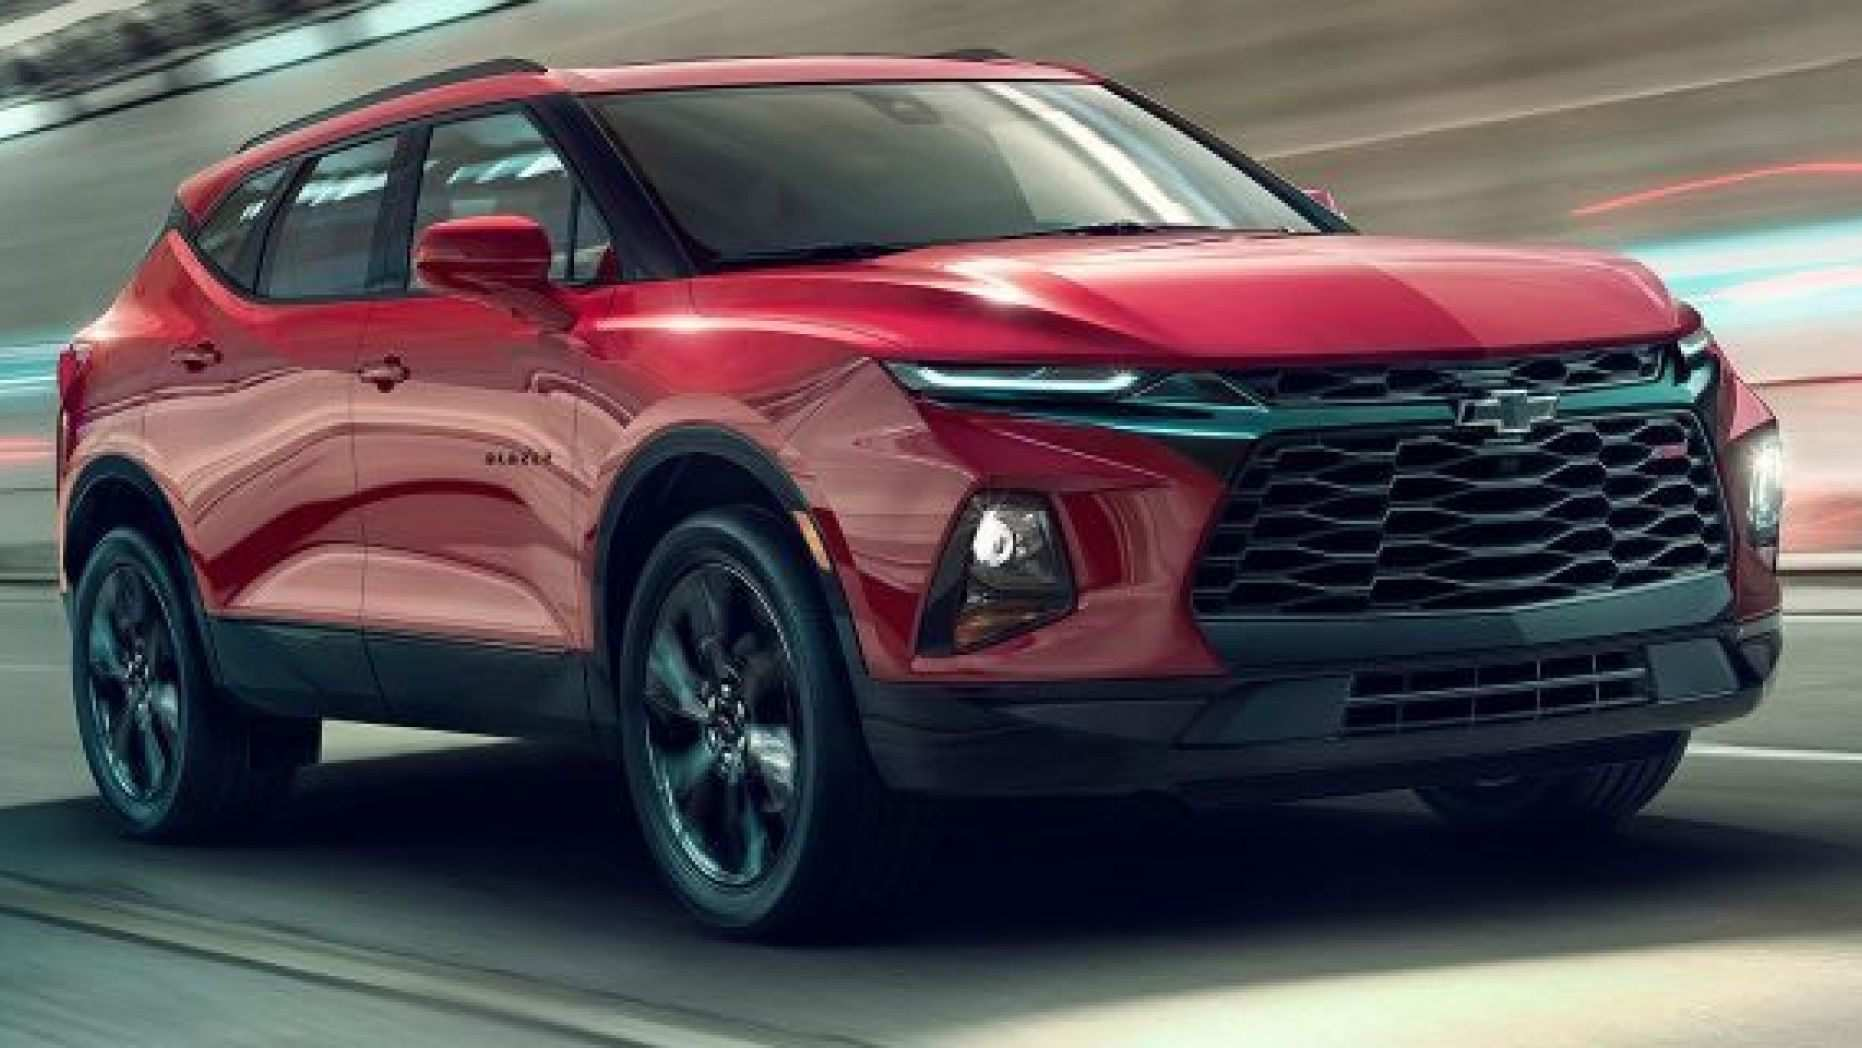 56 All New 2020 Chevy Blazer Concept with 2020 Chevy Blazer